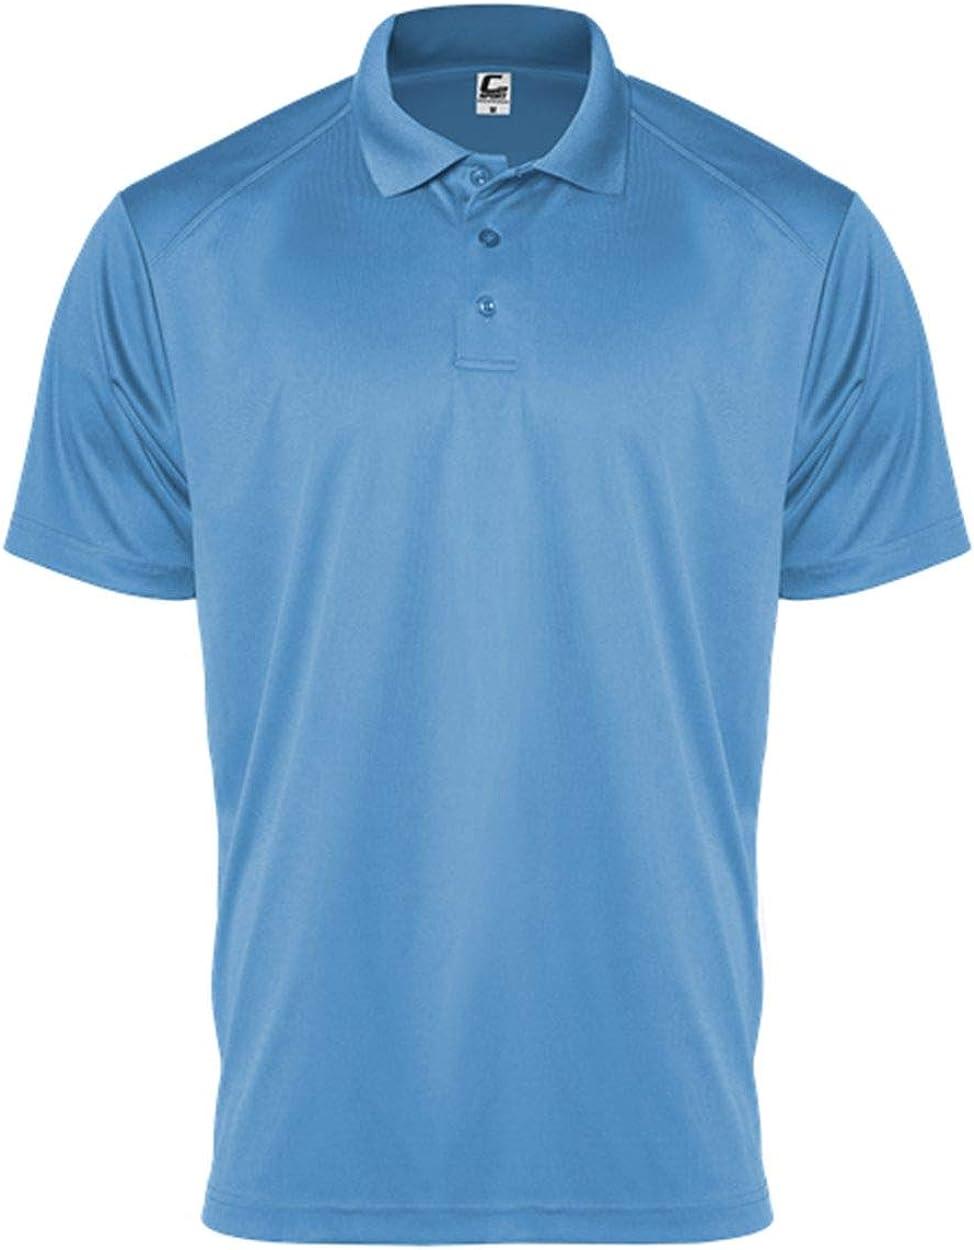 C2 Sport B06885263 Youth Utility Sport Shirt Columbia Blue - Small